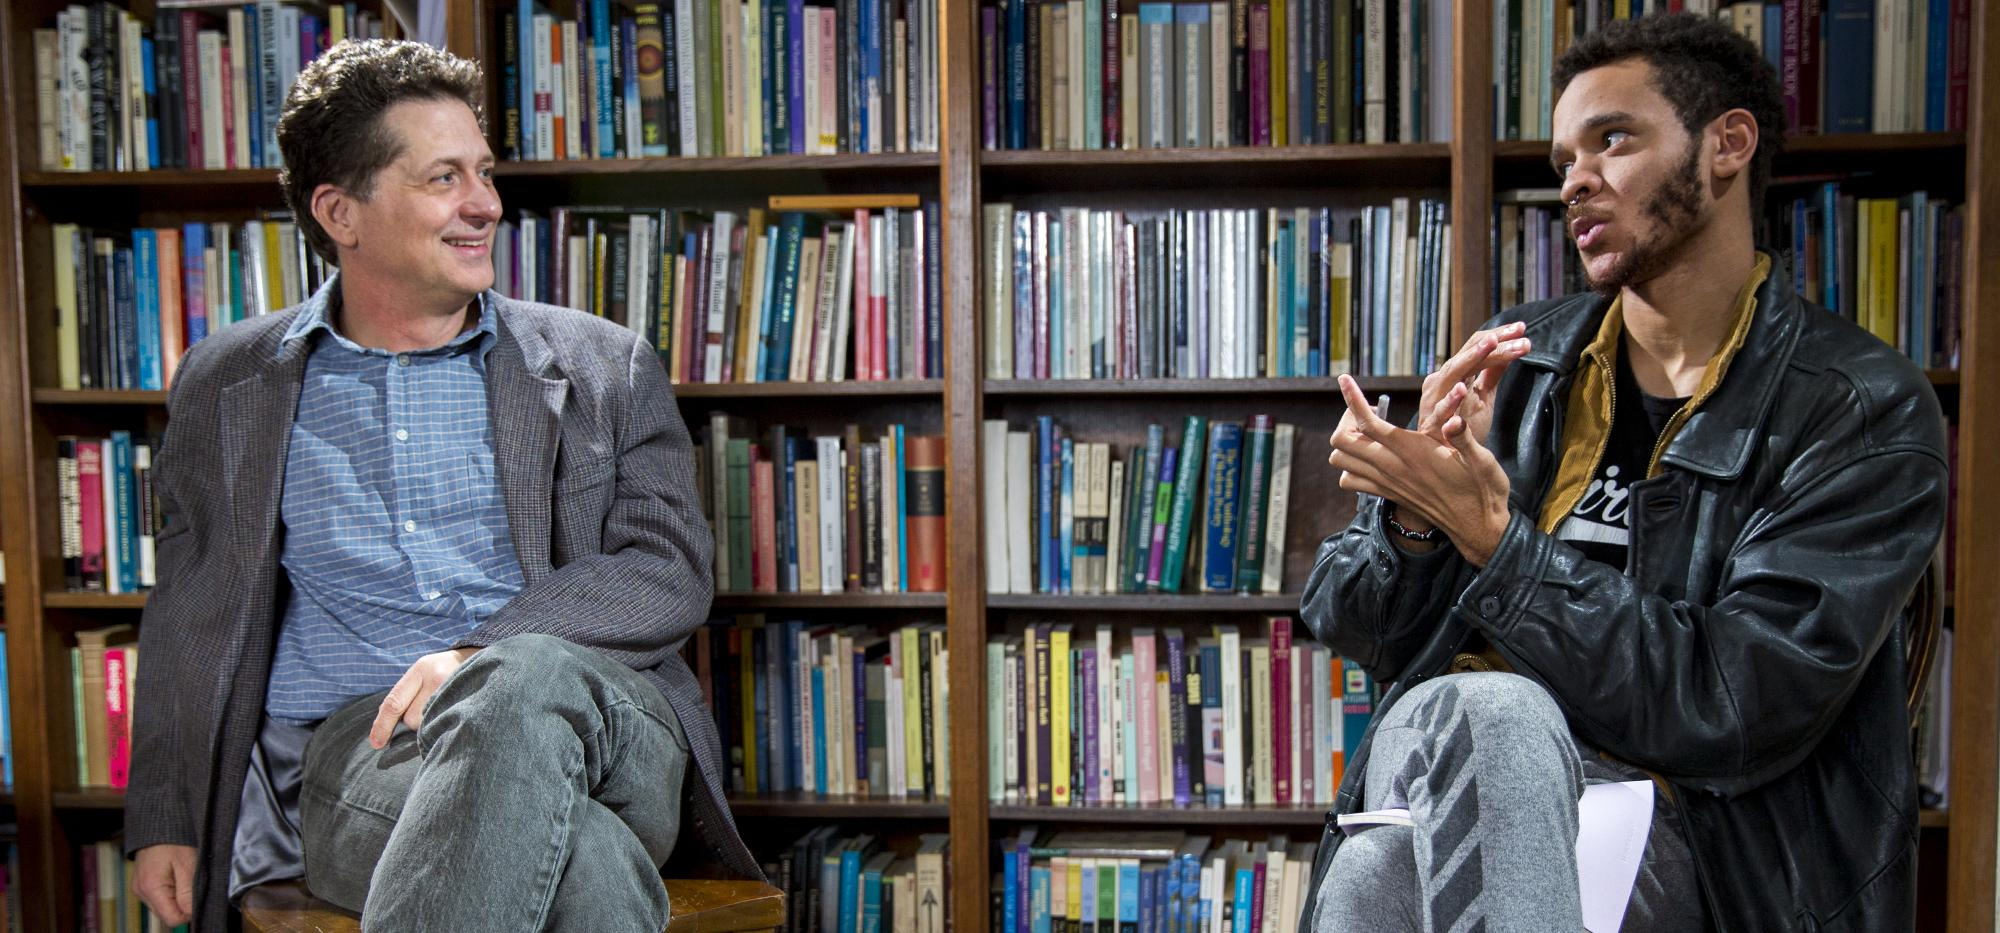 Jermaine Stewart-Webb '16 (right) and Tyler Roberts, professor of religious studies